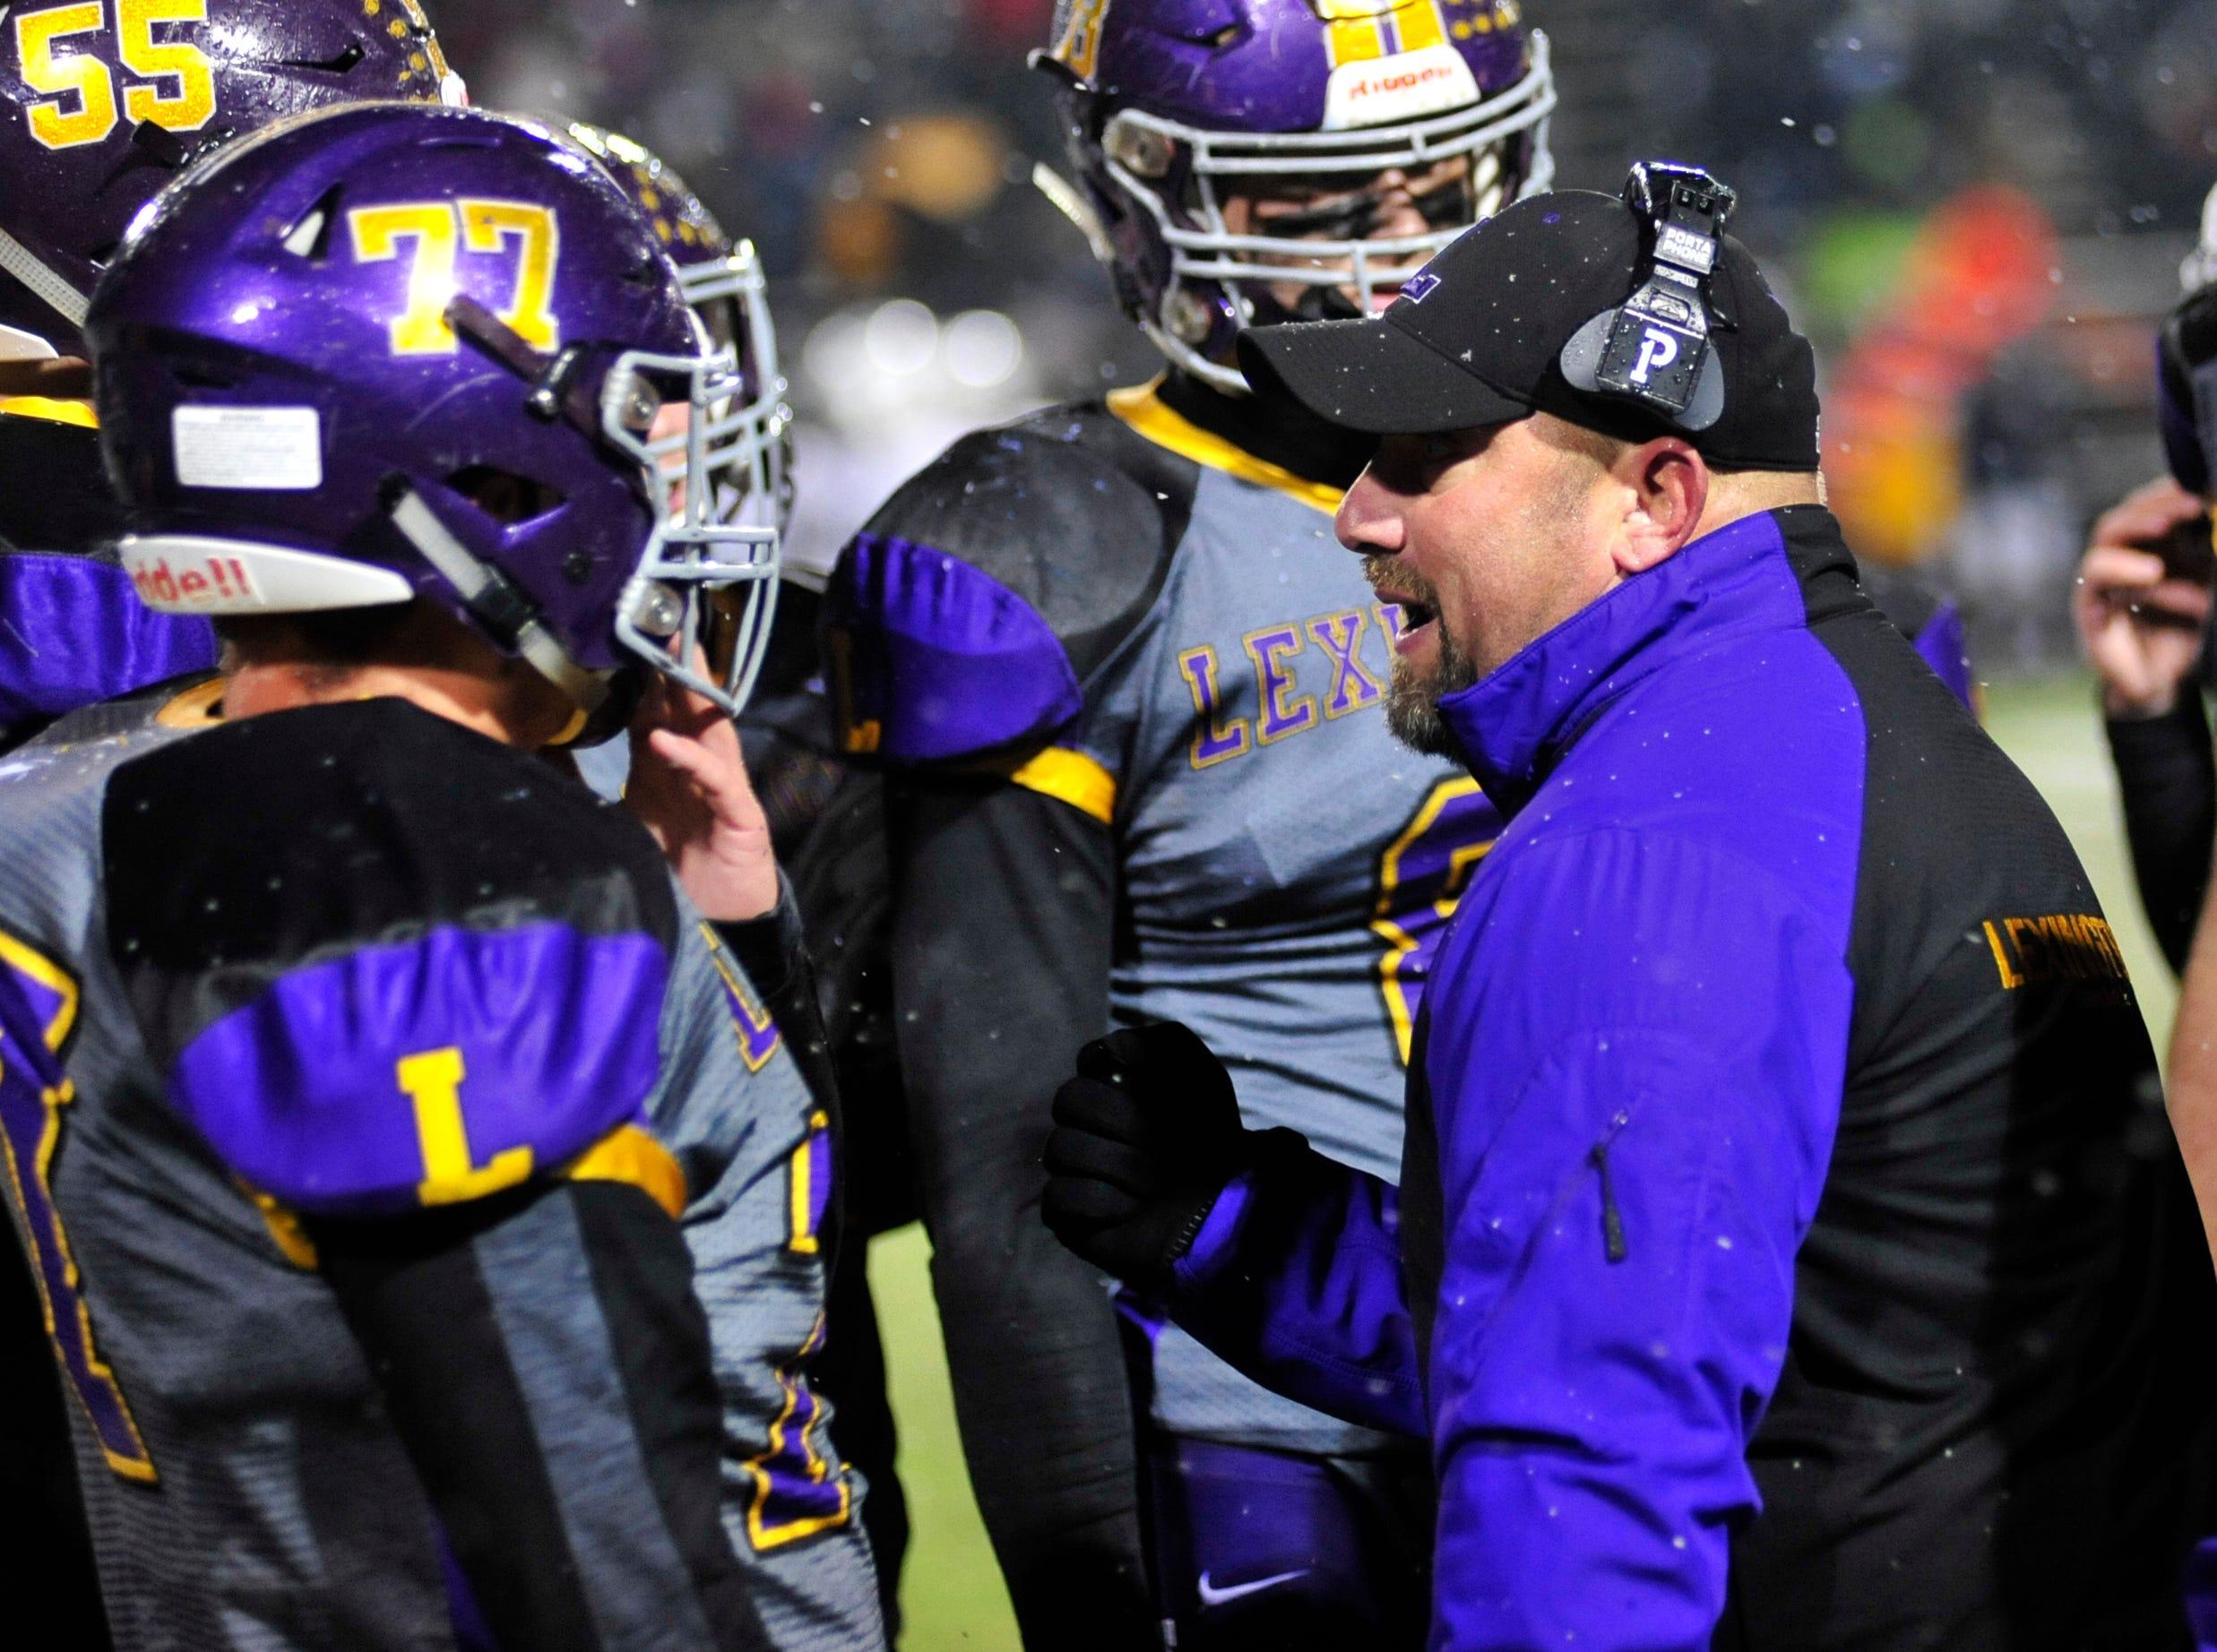 Lexington head coach Taylor Gerhardt talks to his players as they play against Sandusky while playing at Willard High School on Friday.